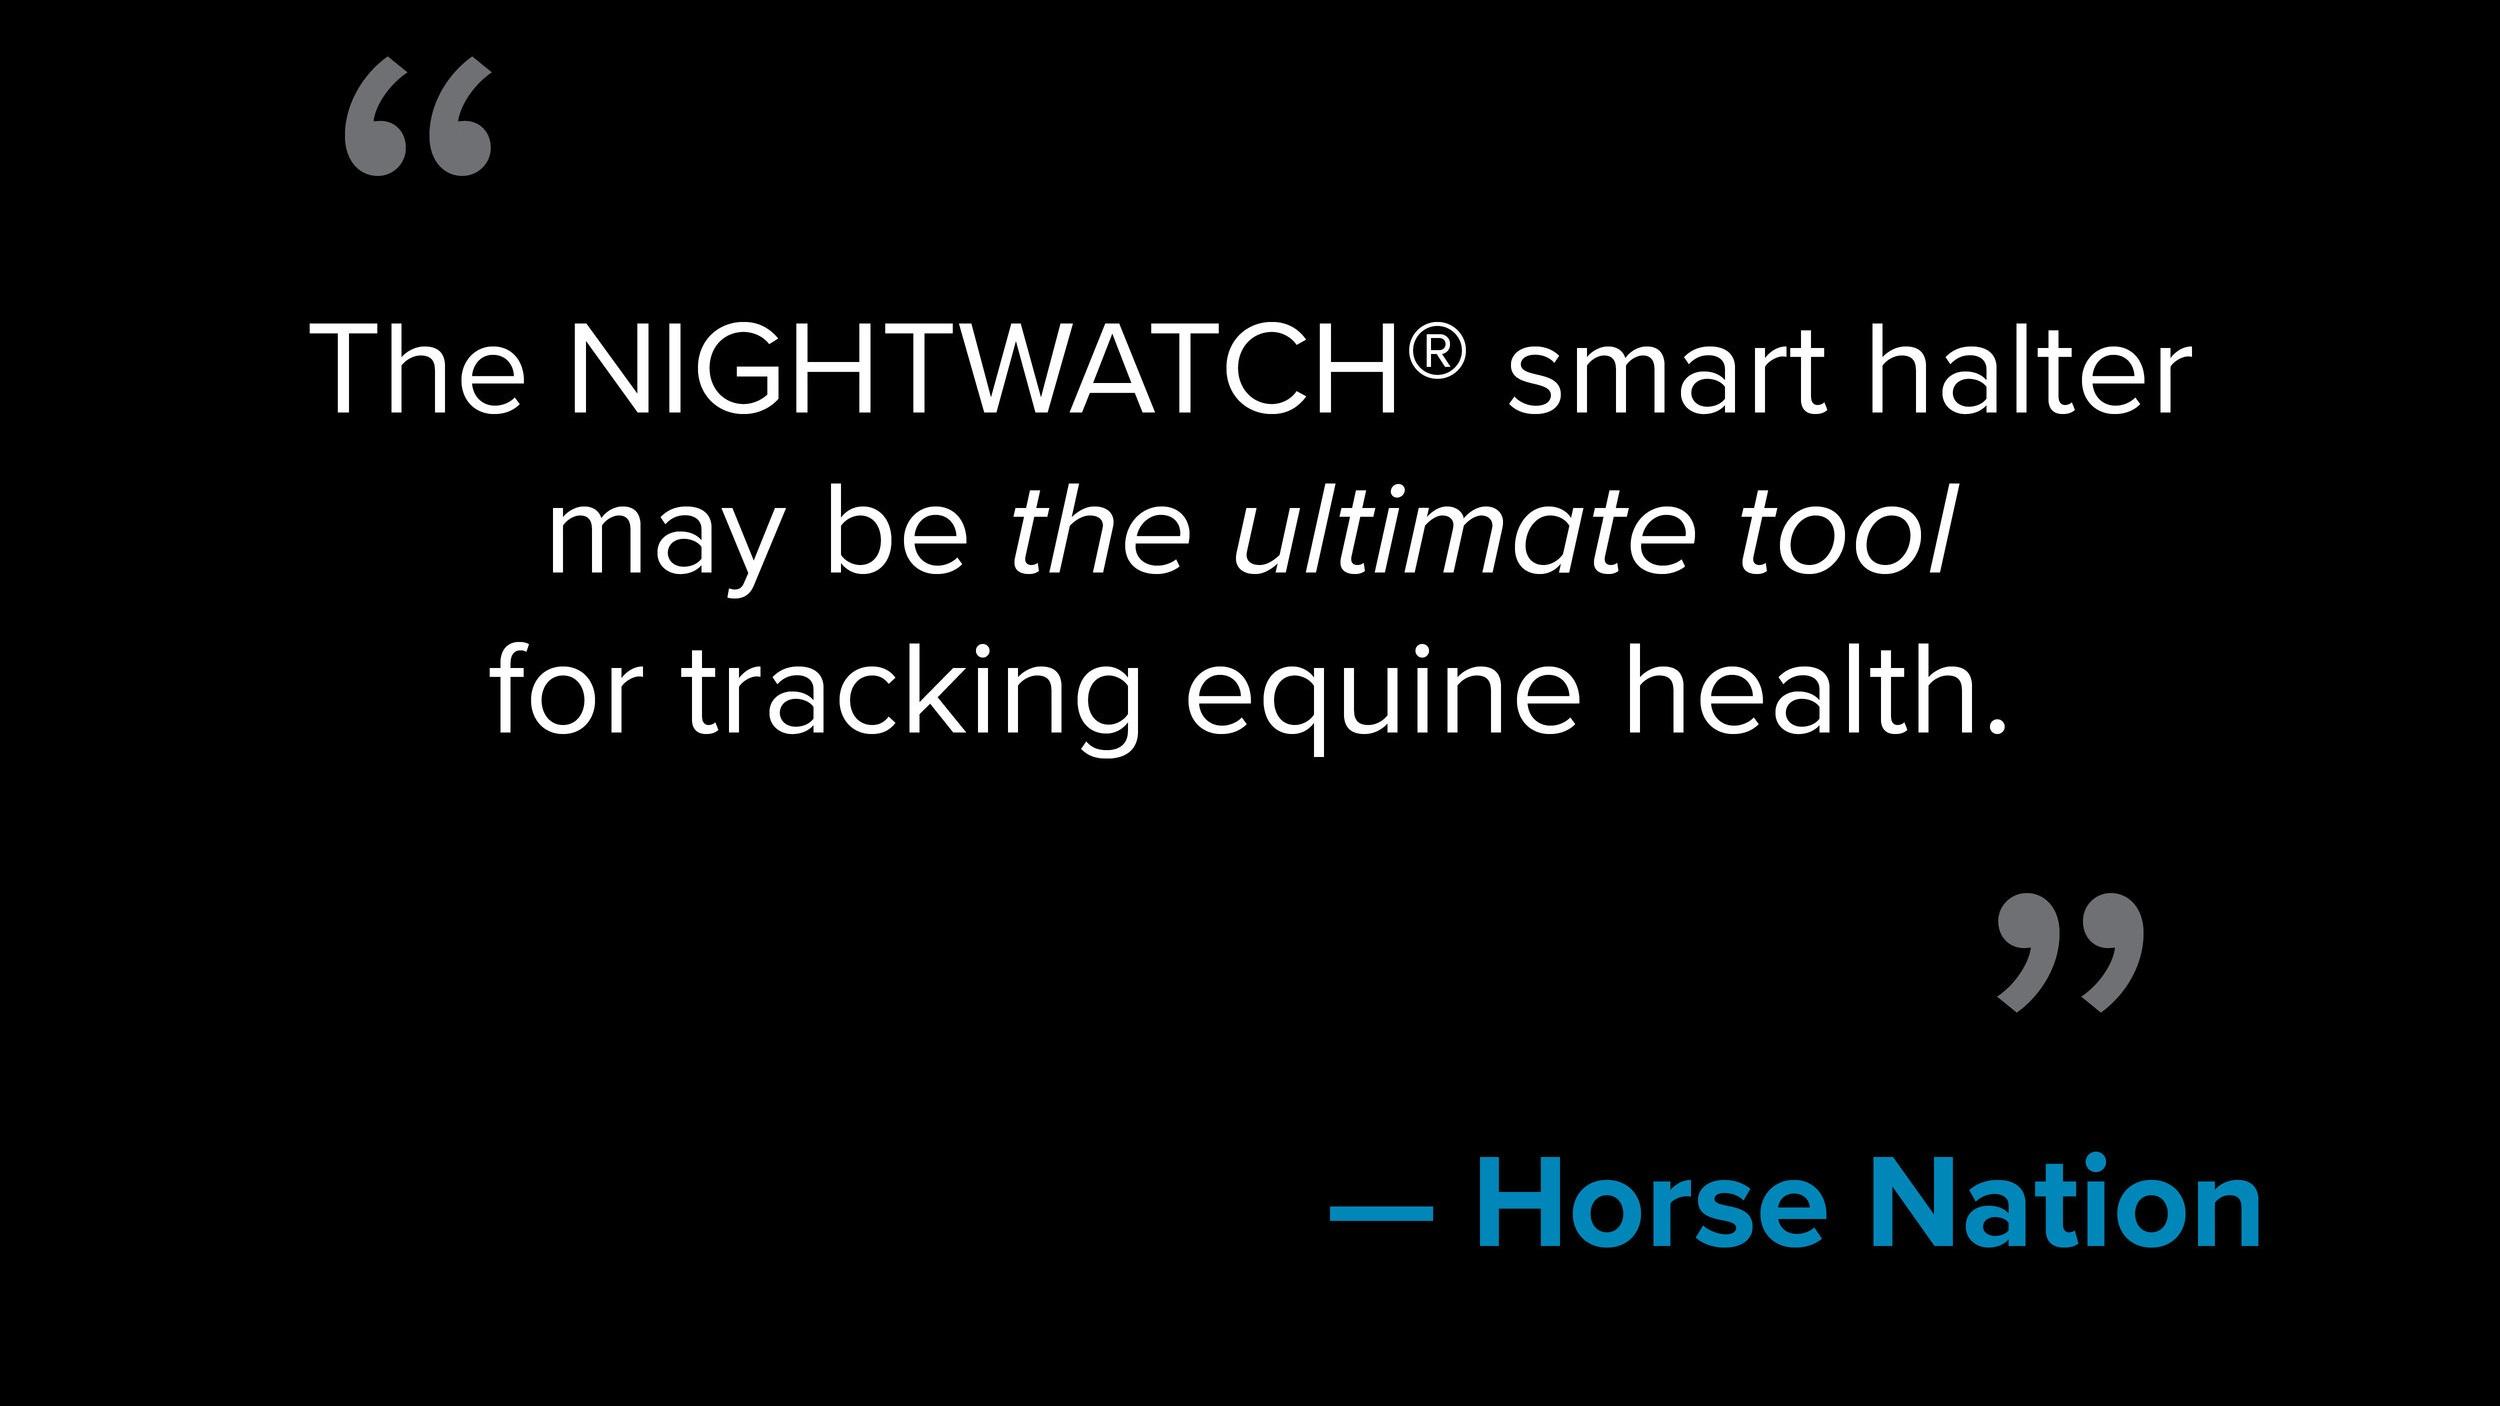 Quotes-HorseNation.jpg